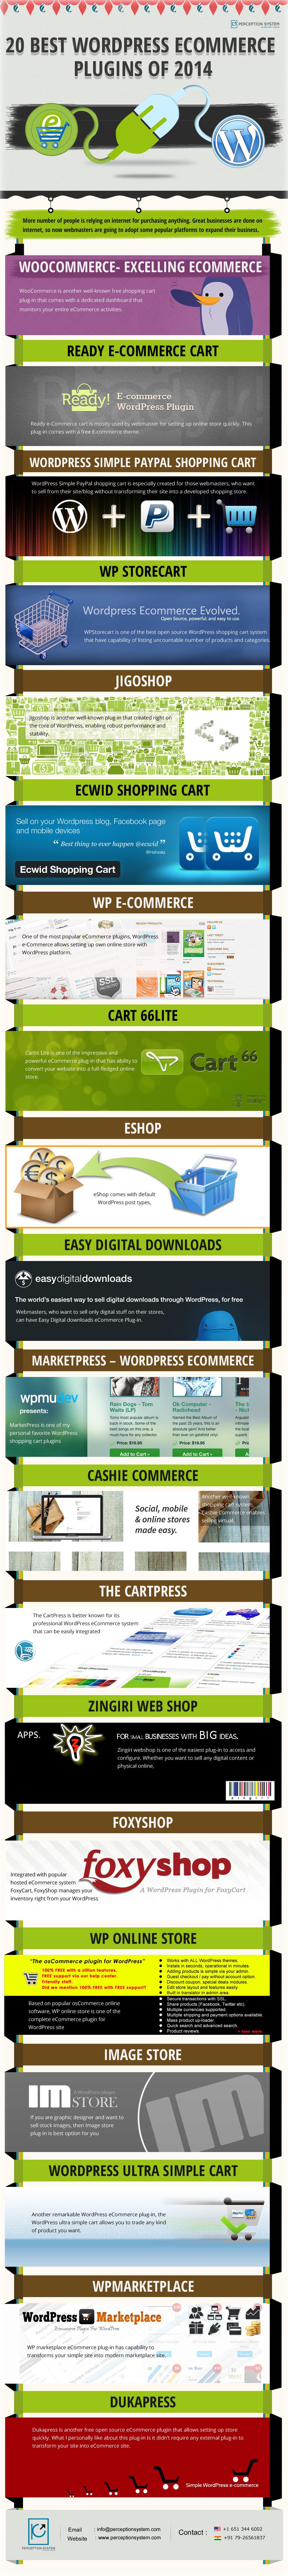 wordpress-ecommerce-plugin-2014